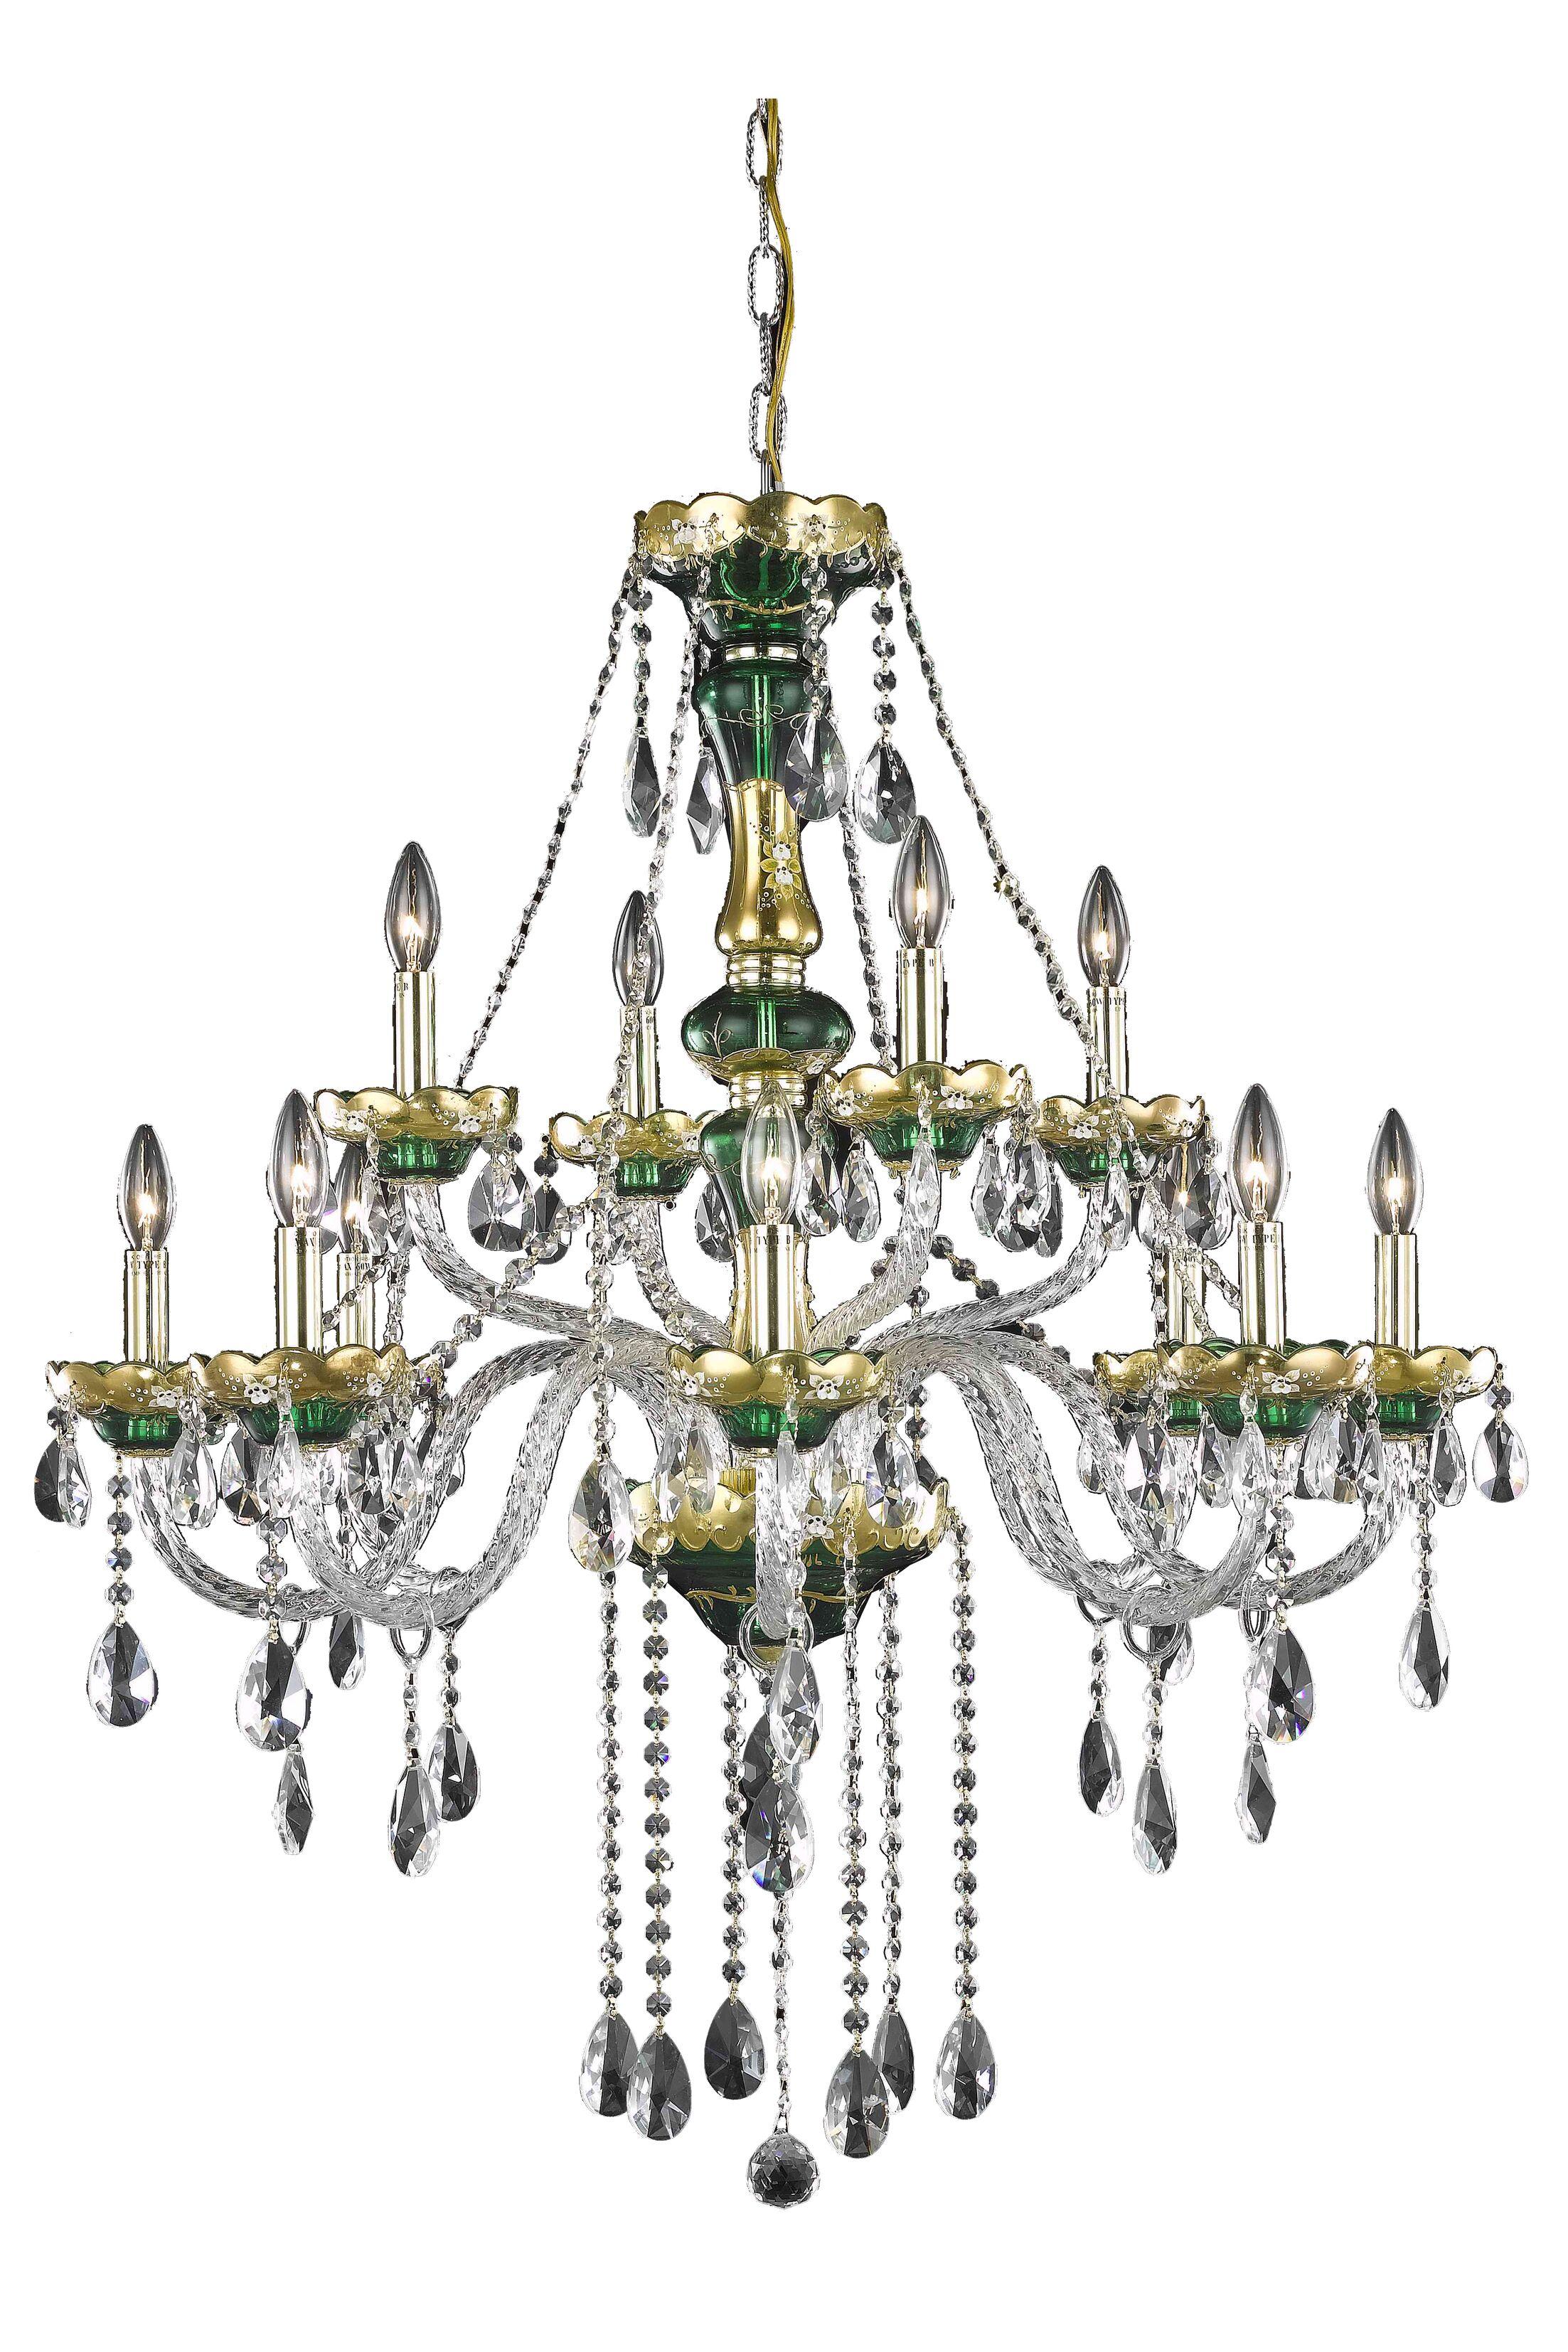 Schroeppel 12-Light Candle Style Chandelier with Chain Crystal Trim: Strass Swarovski